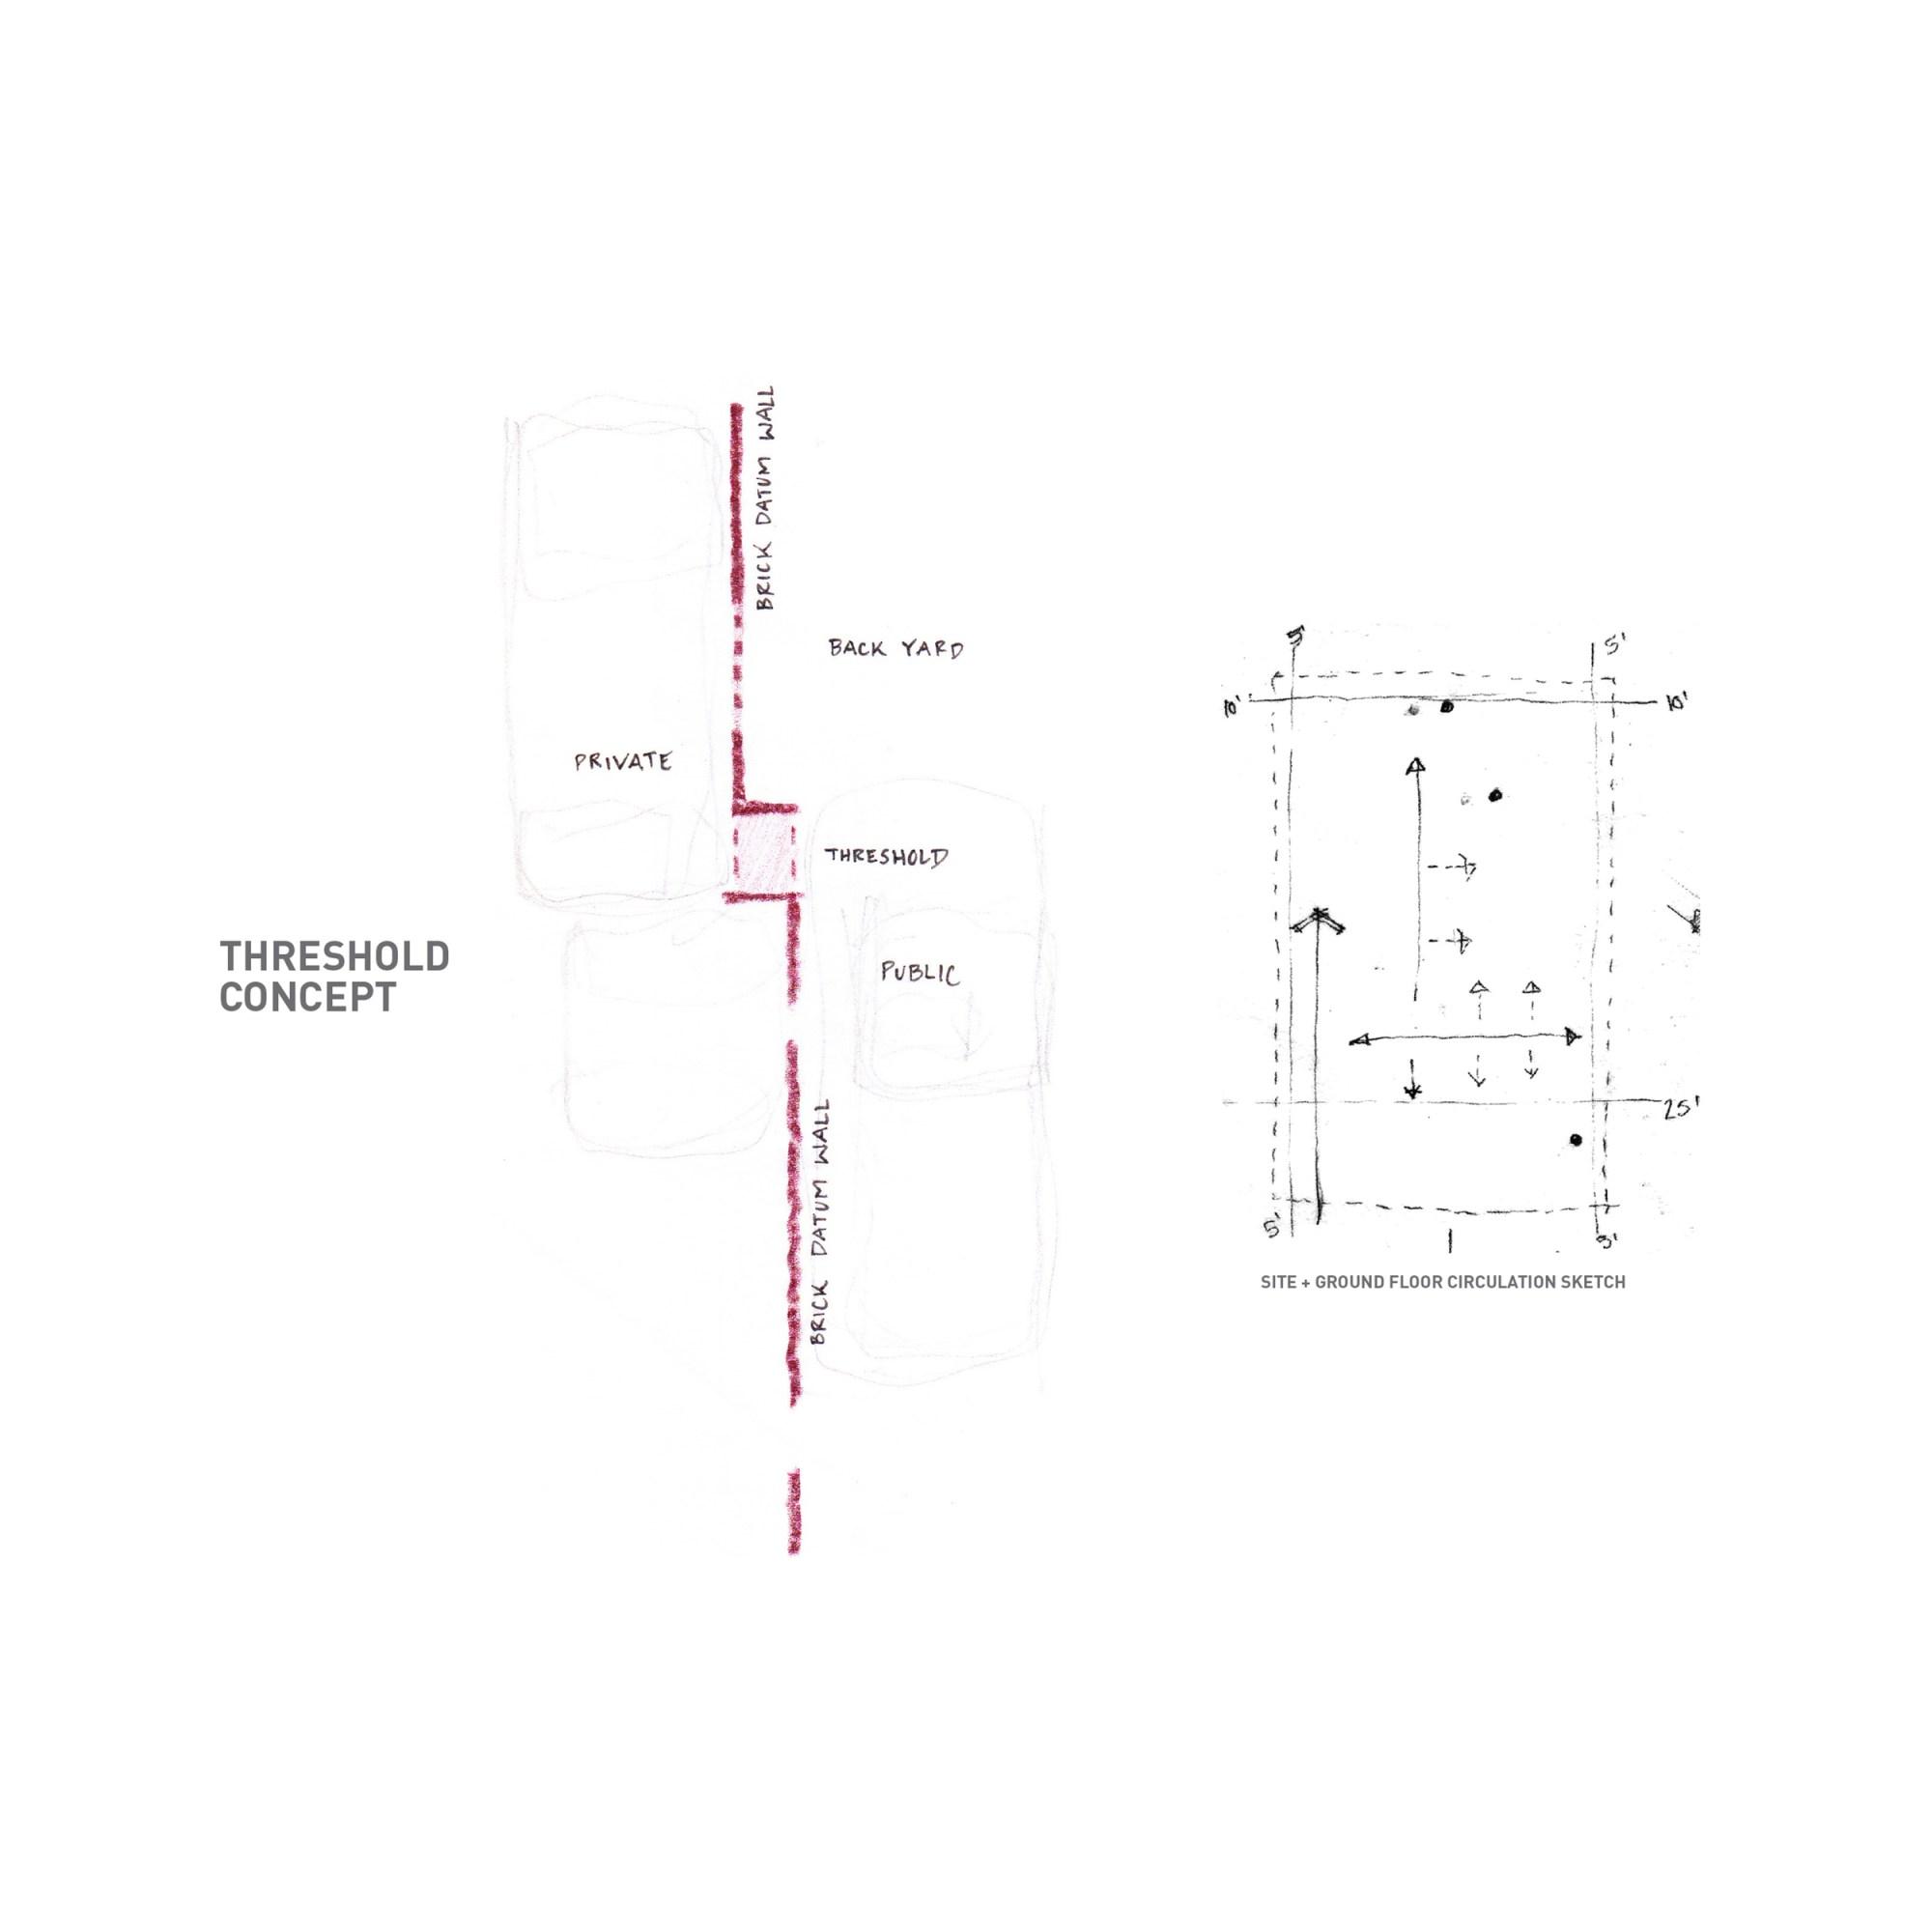 hight resolution of threshold concept jpg